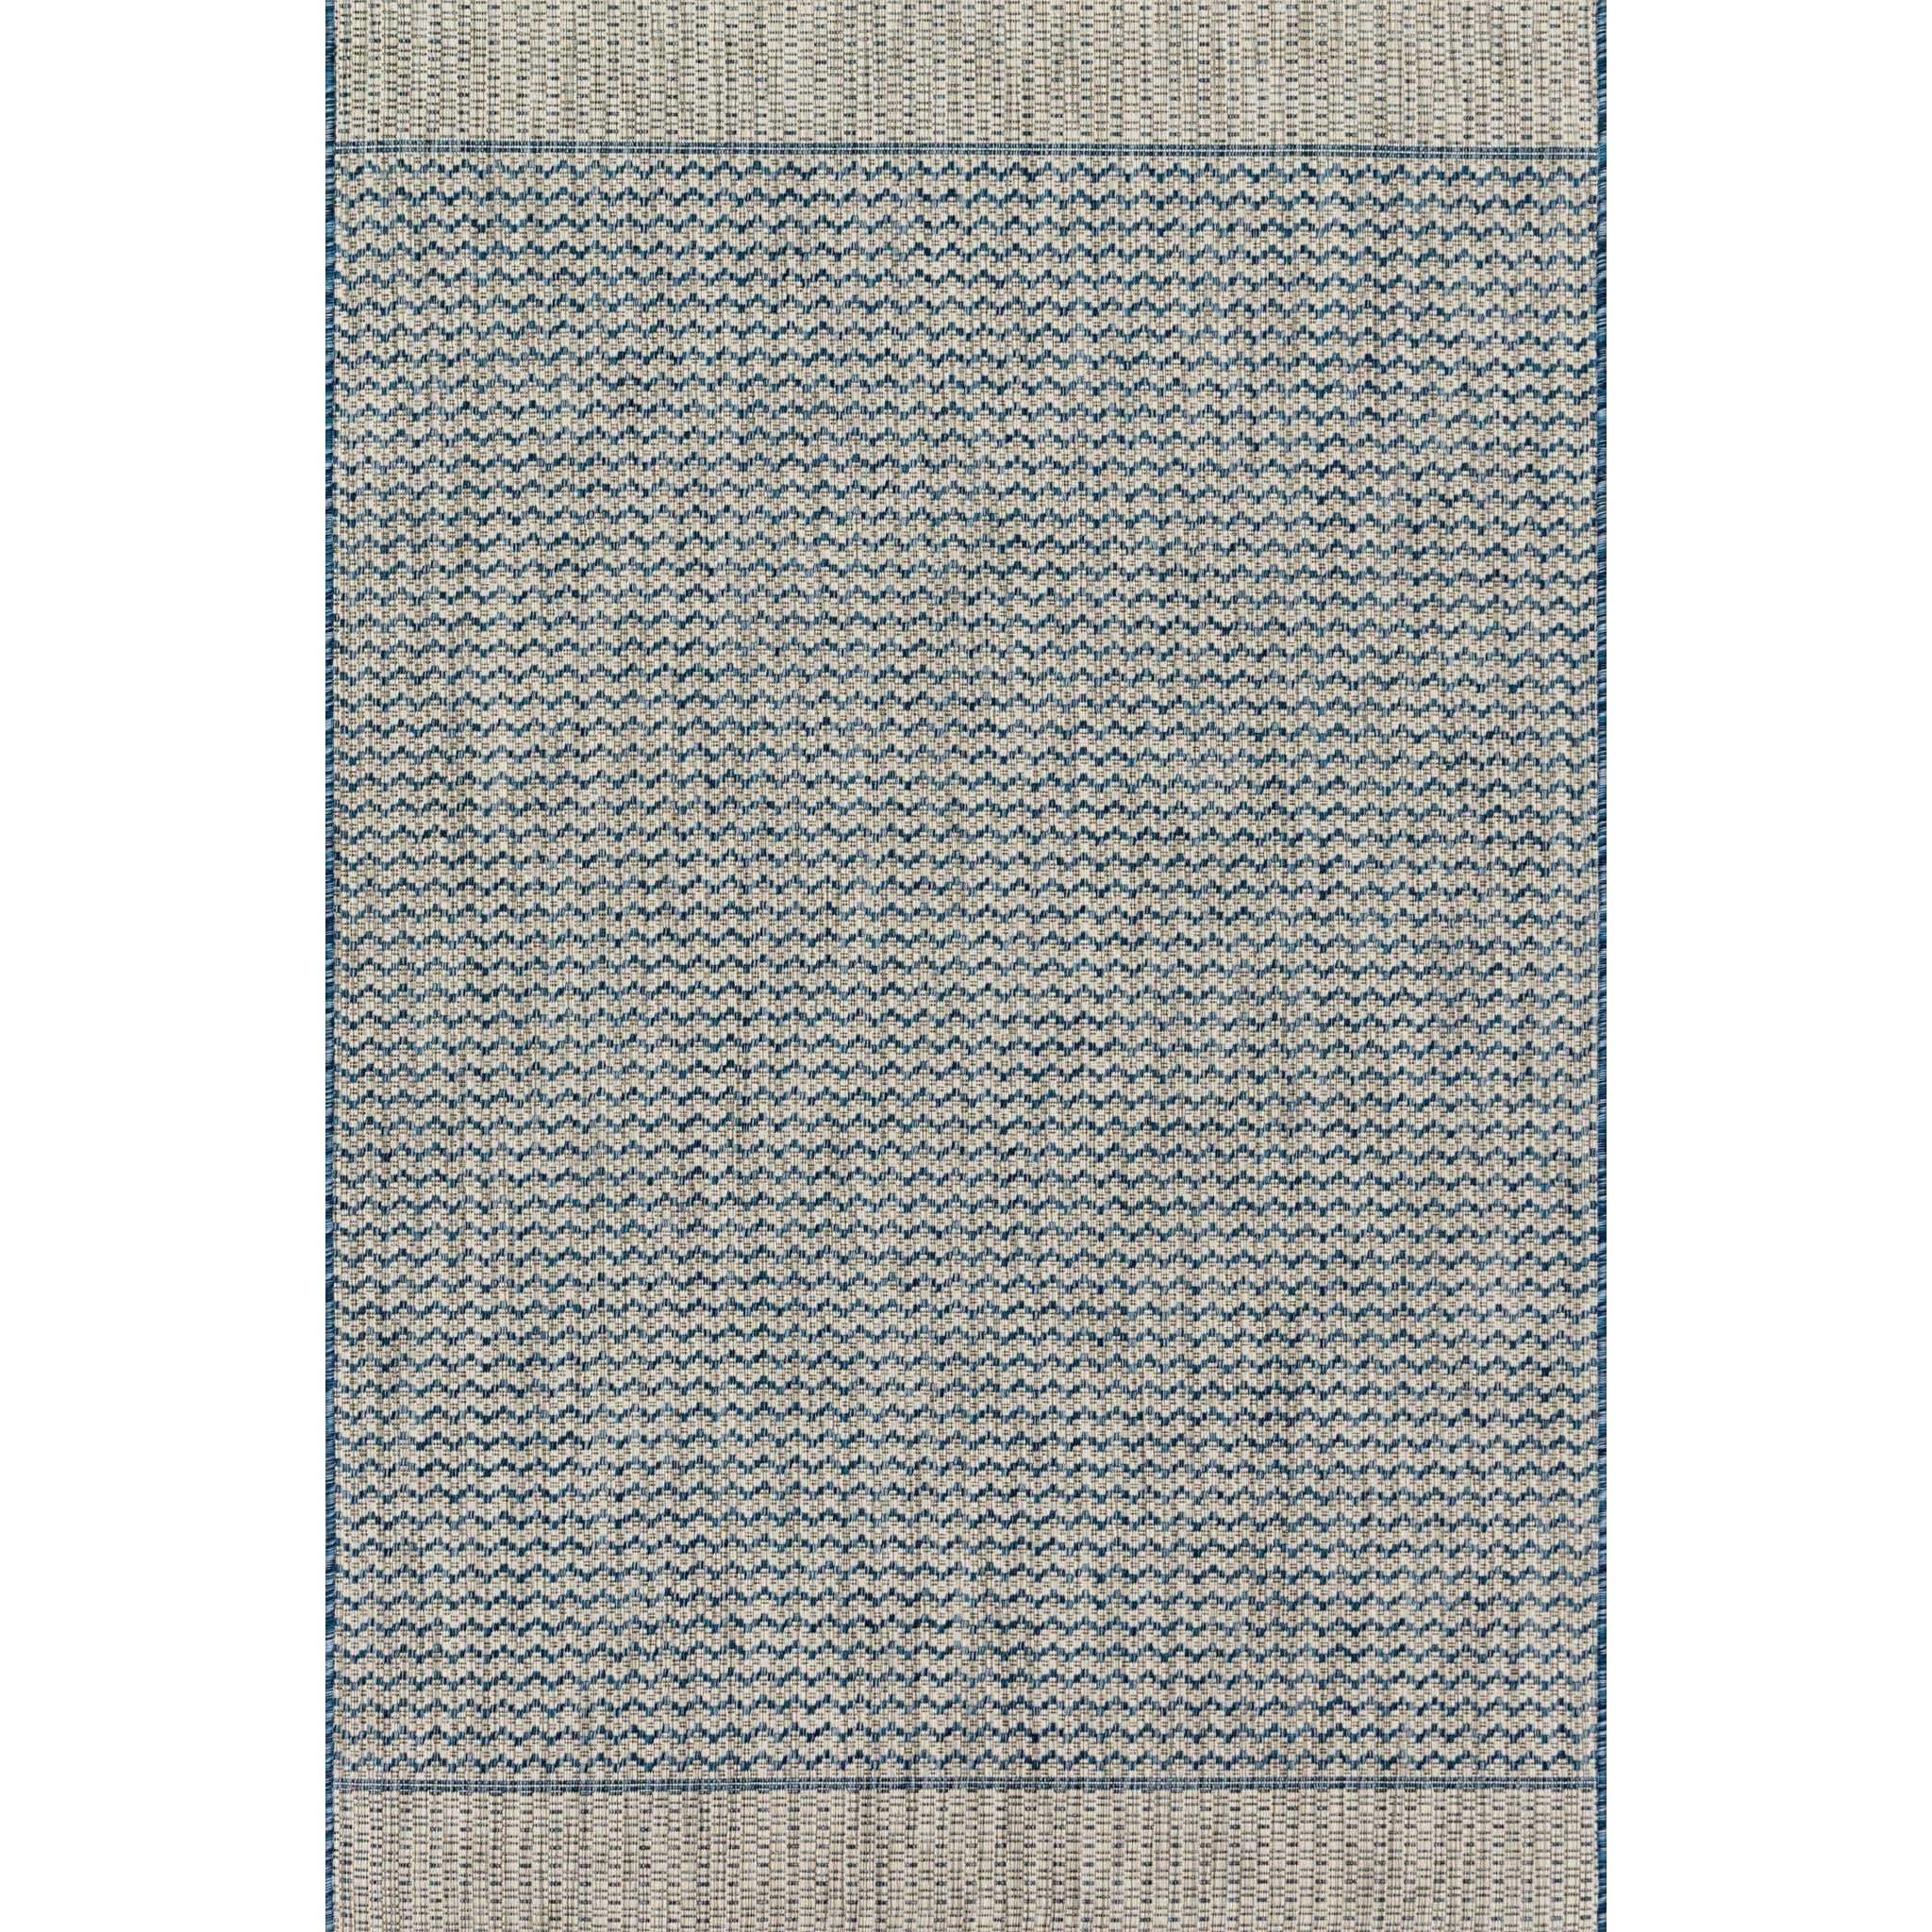 "Isle 9'-2"" x 12'-1"" Area Rug by Loloi Rugs at Virginia Furniture Market"